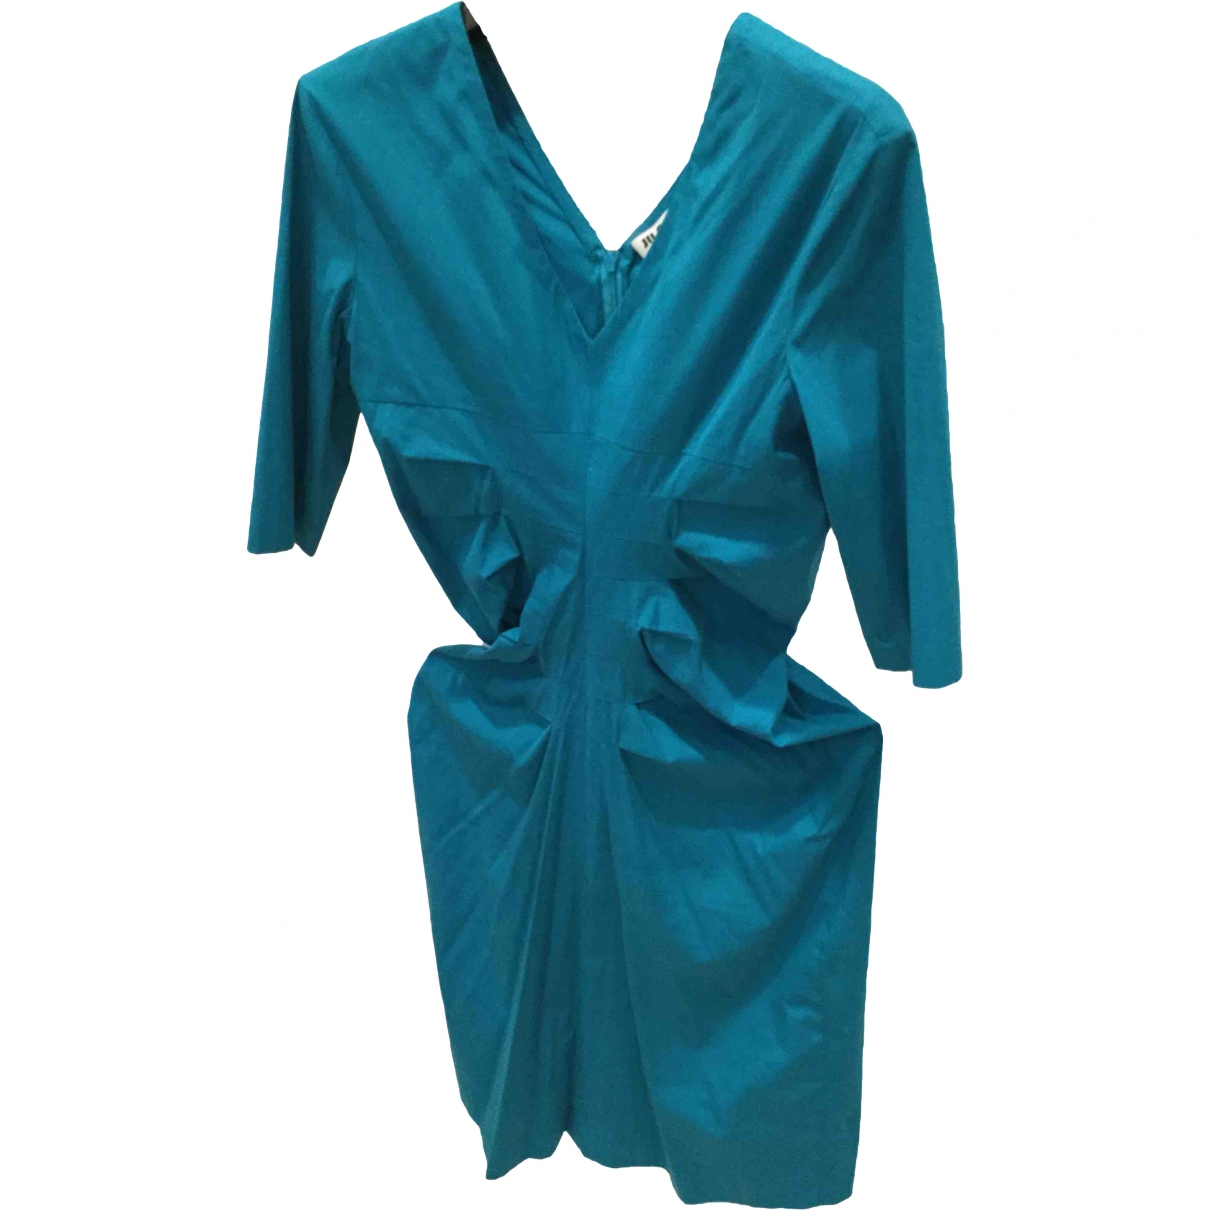 Jil Sander \N Turquoise Cotton dress for Women 40 IT